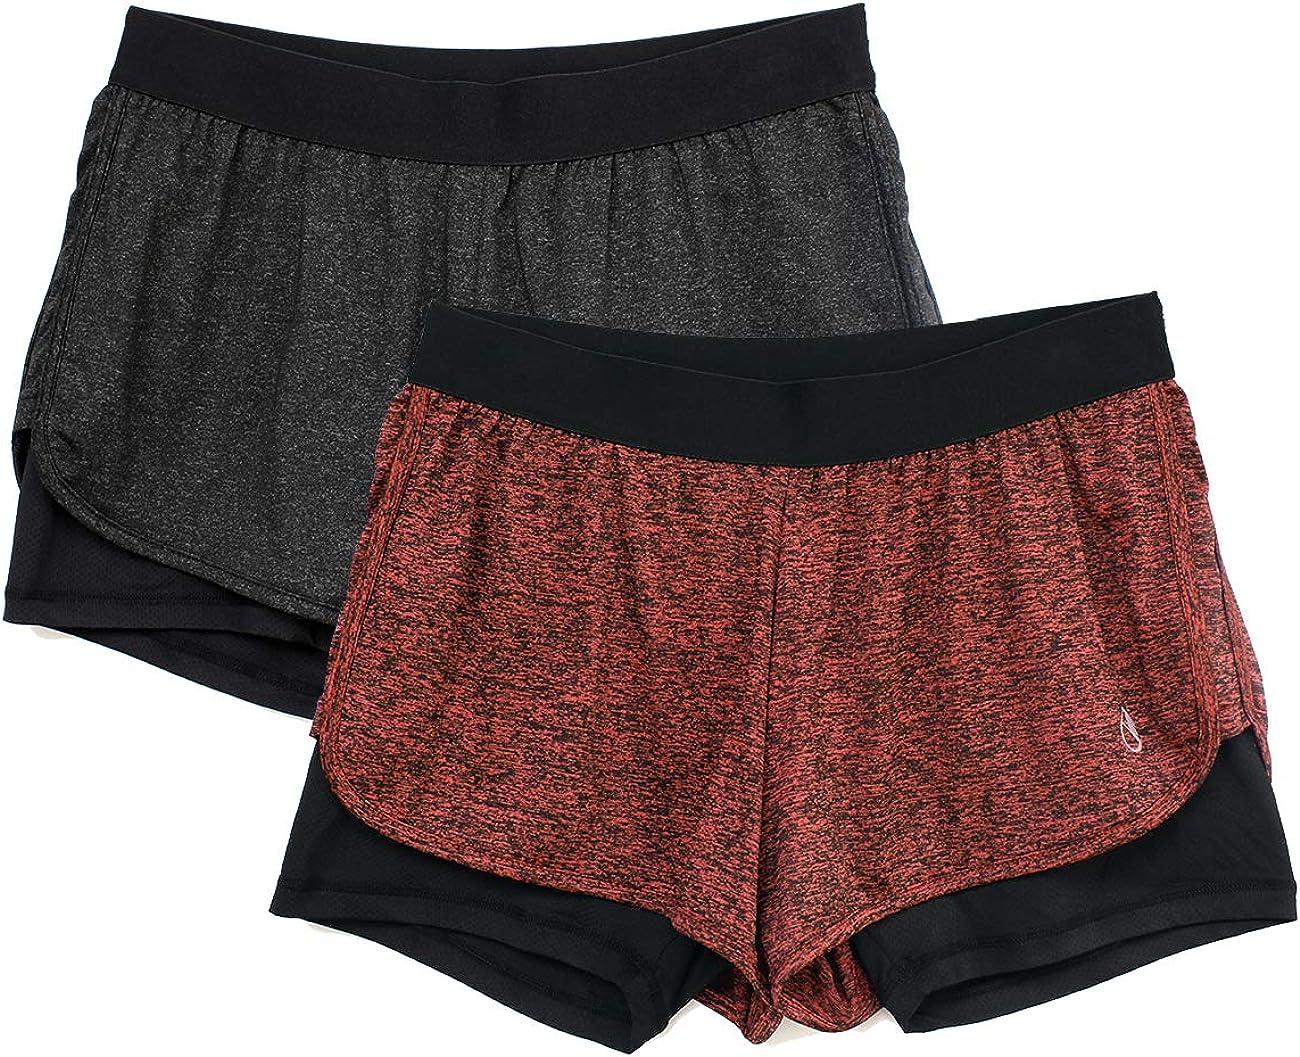 icyzone Damen 2 in 1 Sport Shorts Training Yoga Kurze Hose Laufshorts 2er Pack